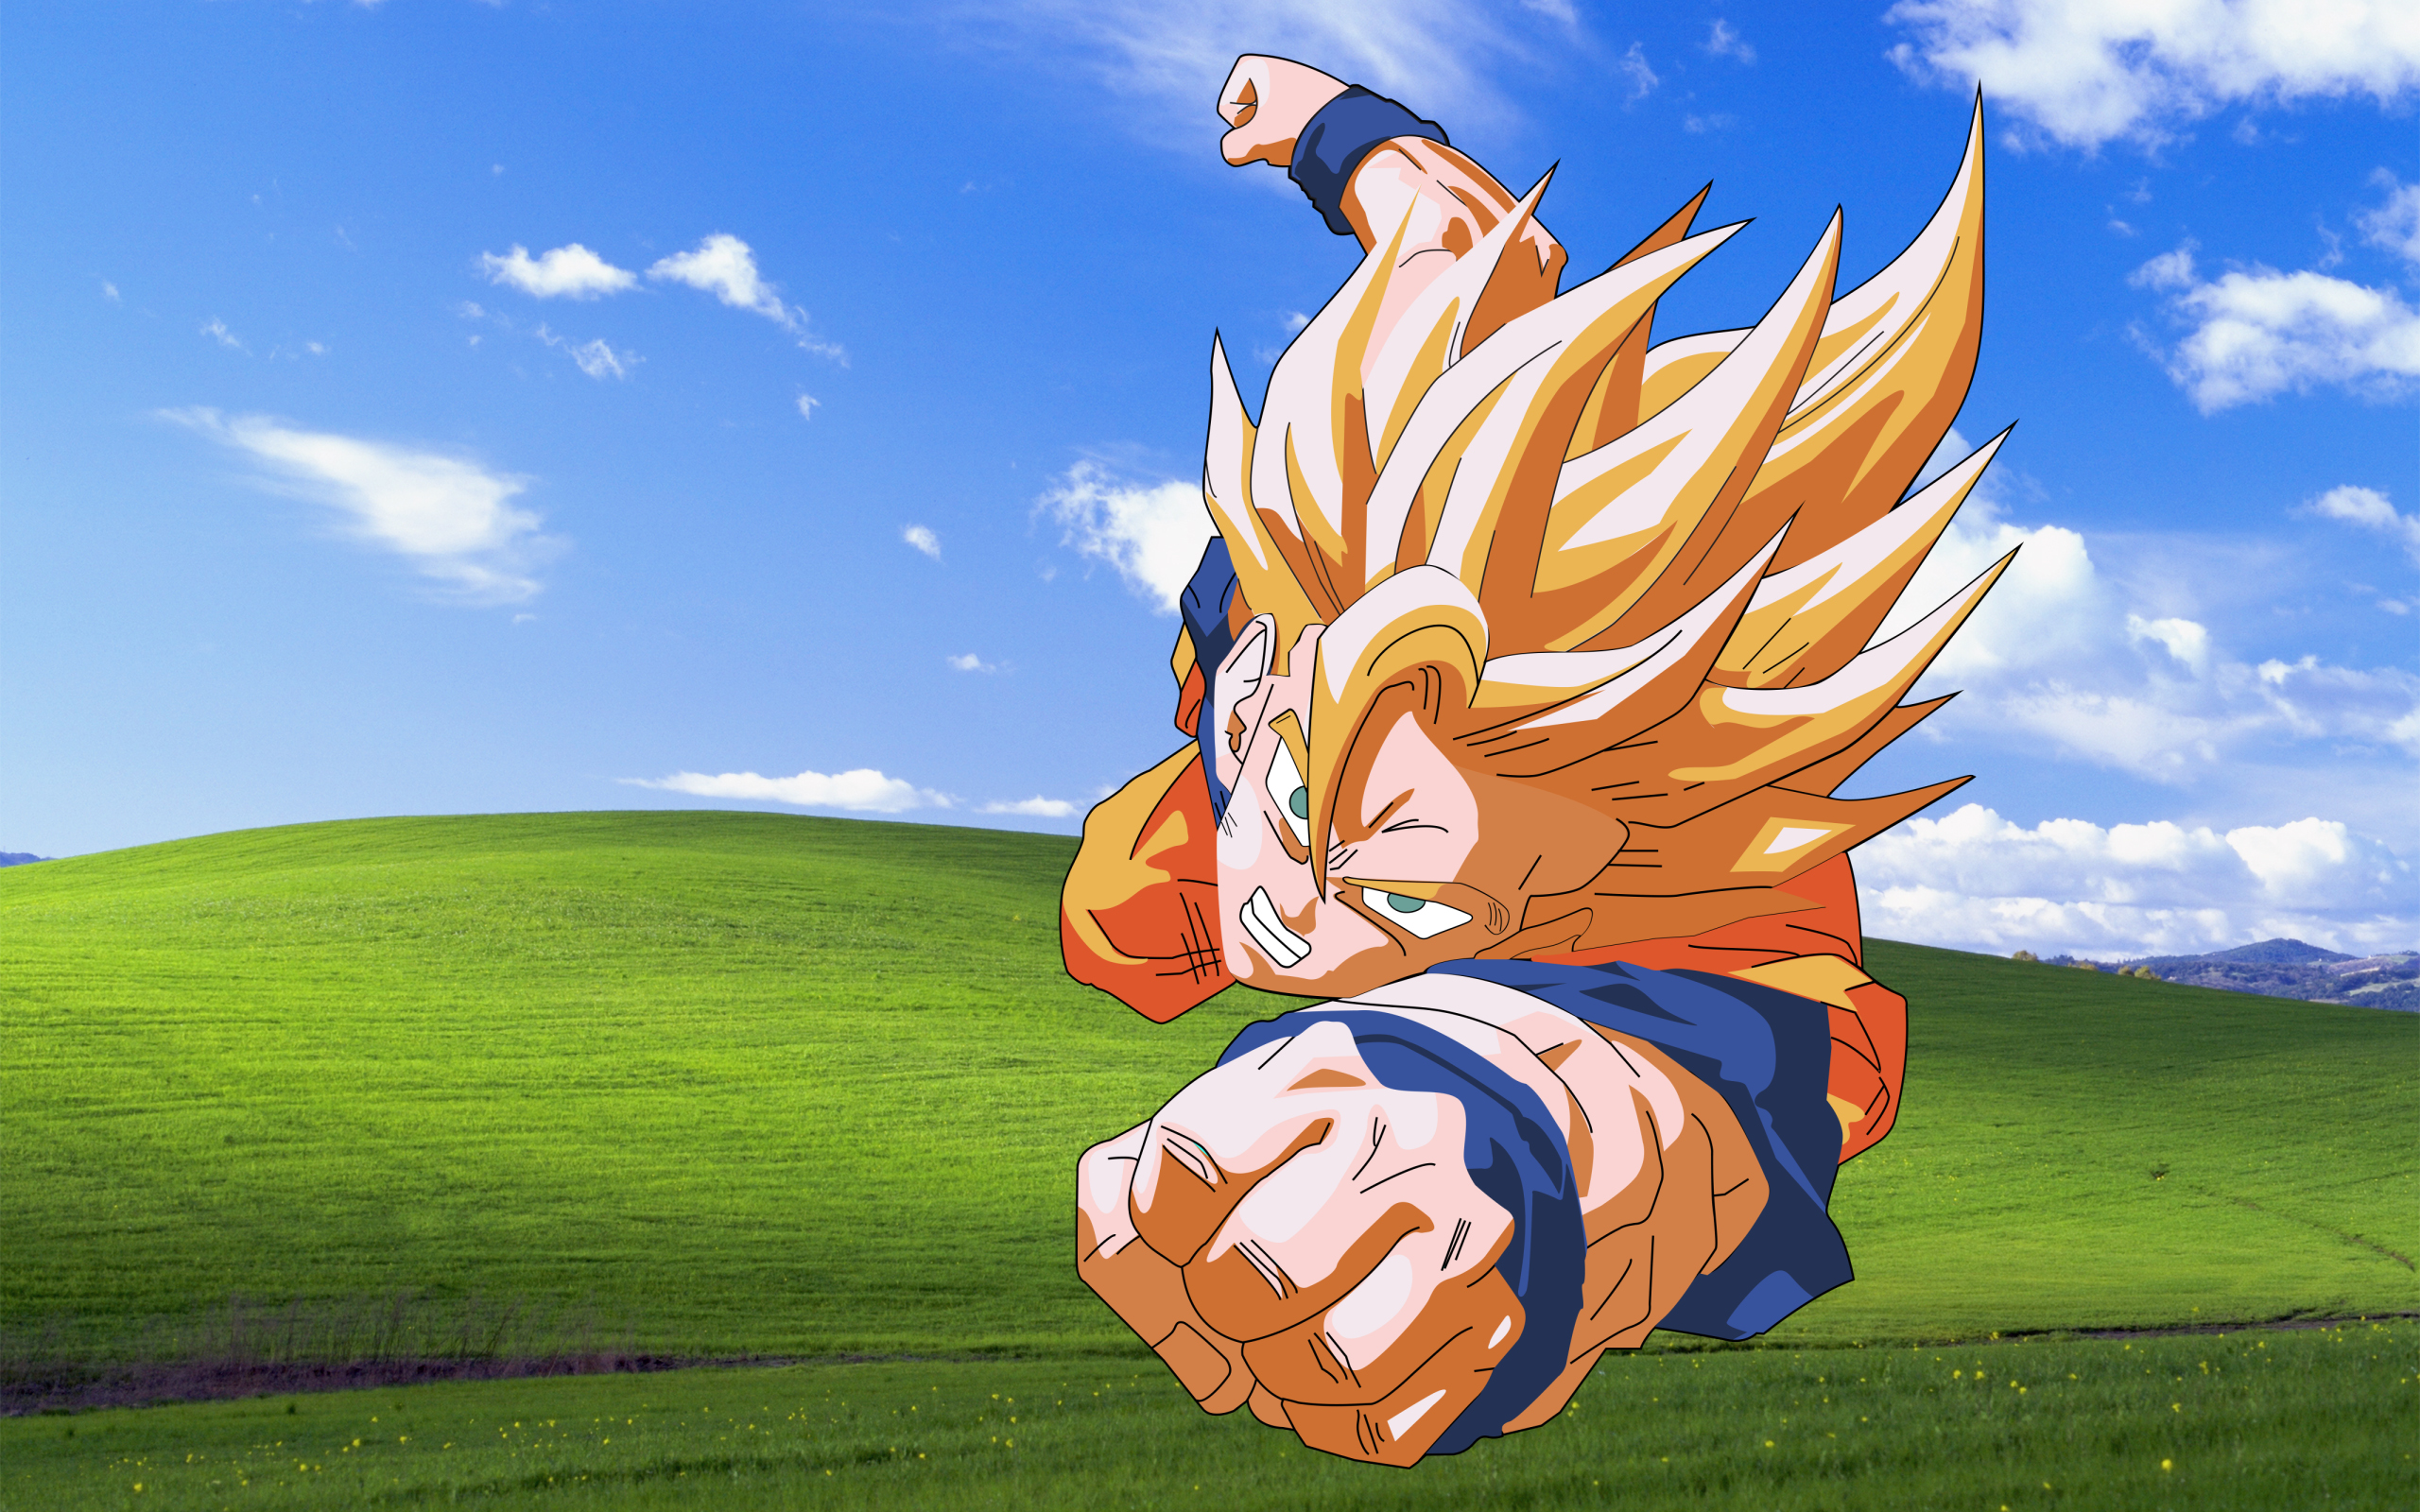 Dragon Ball Z Goku Windows 7 Wallpaper in High Resolution at Anime 2560x1600